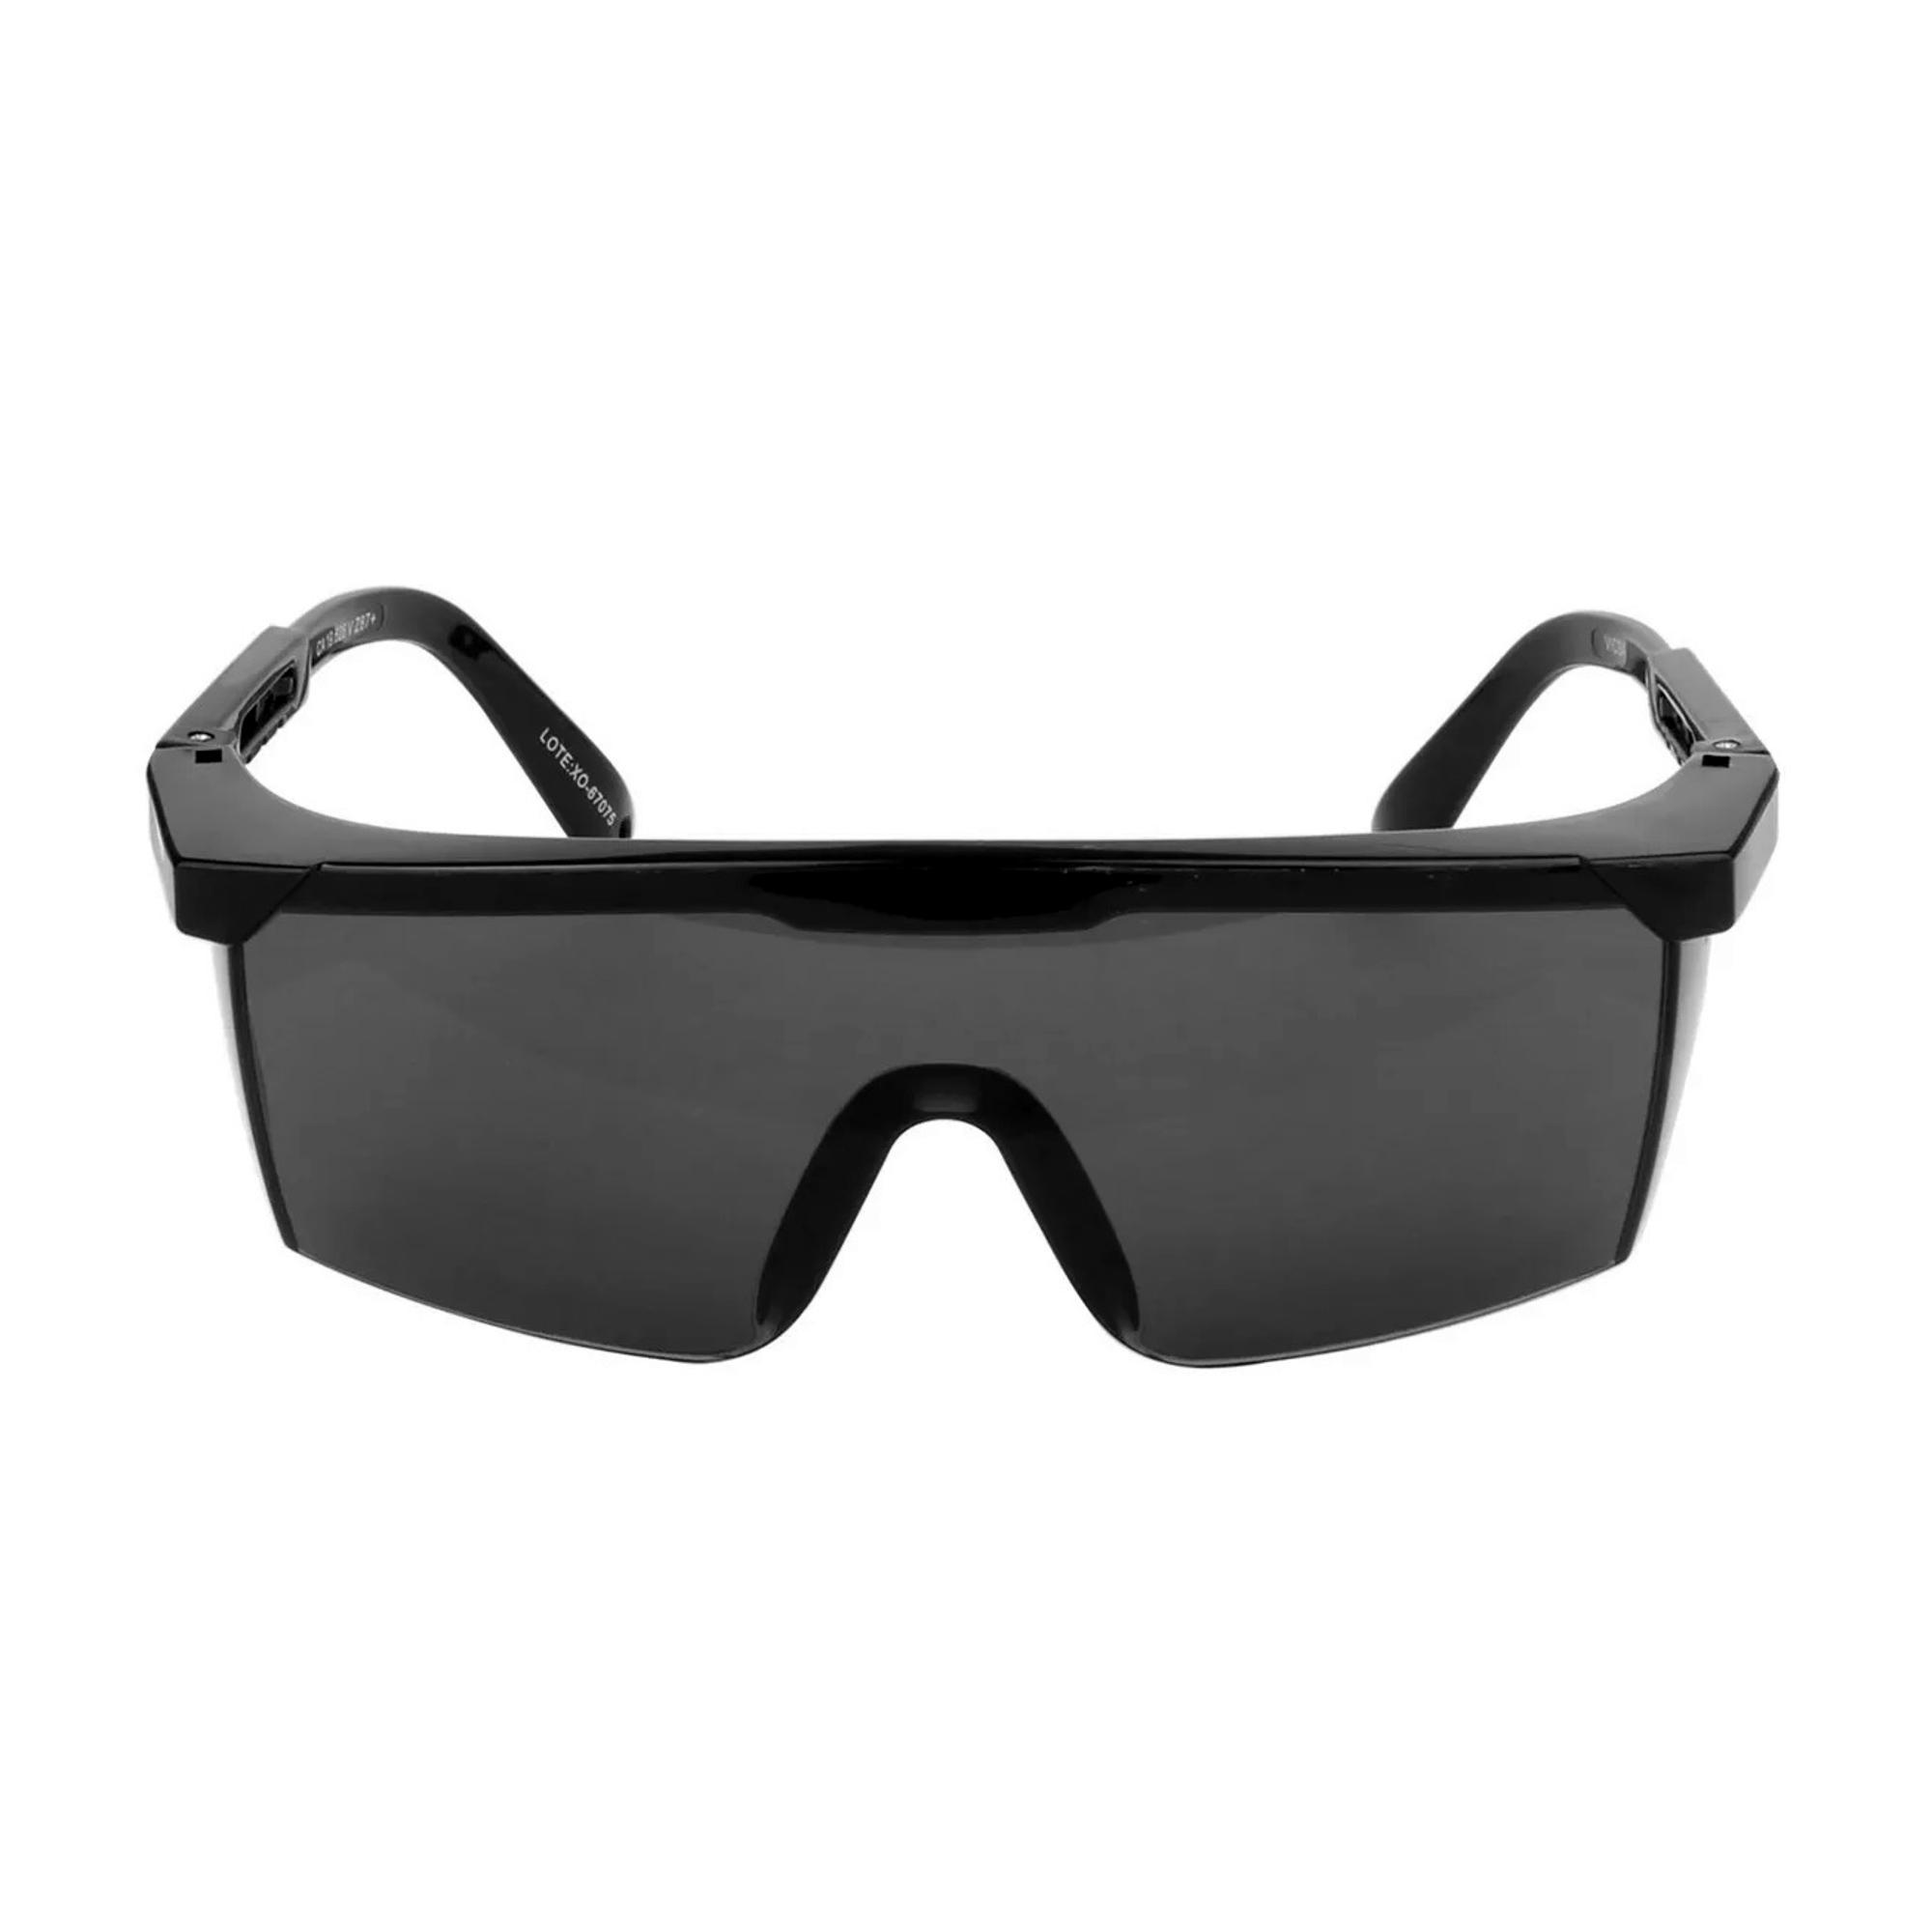 Kit De 3 Peças De Oculos Seguranca Nitro -- Rj Vicsa Cinza